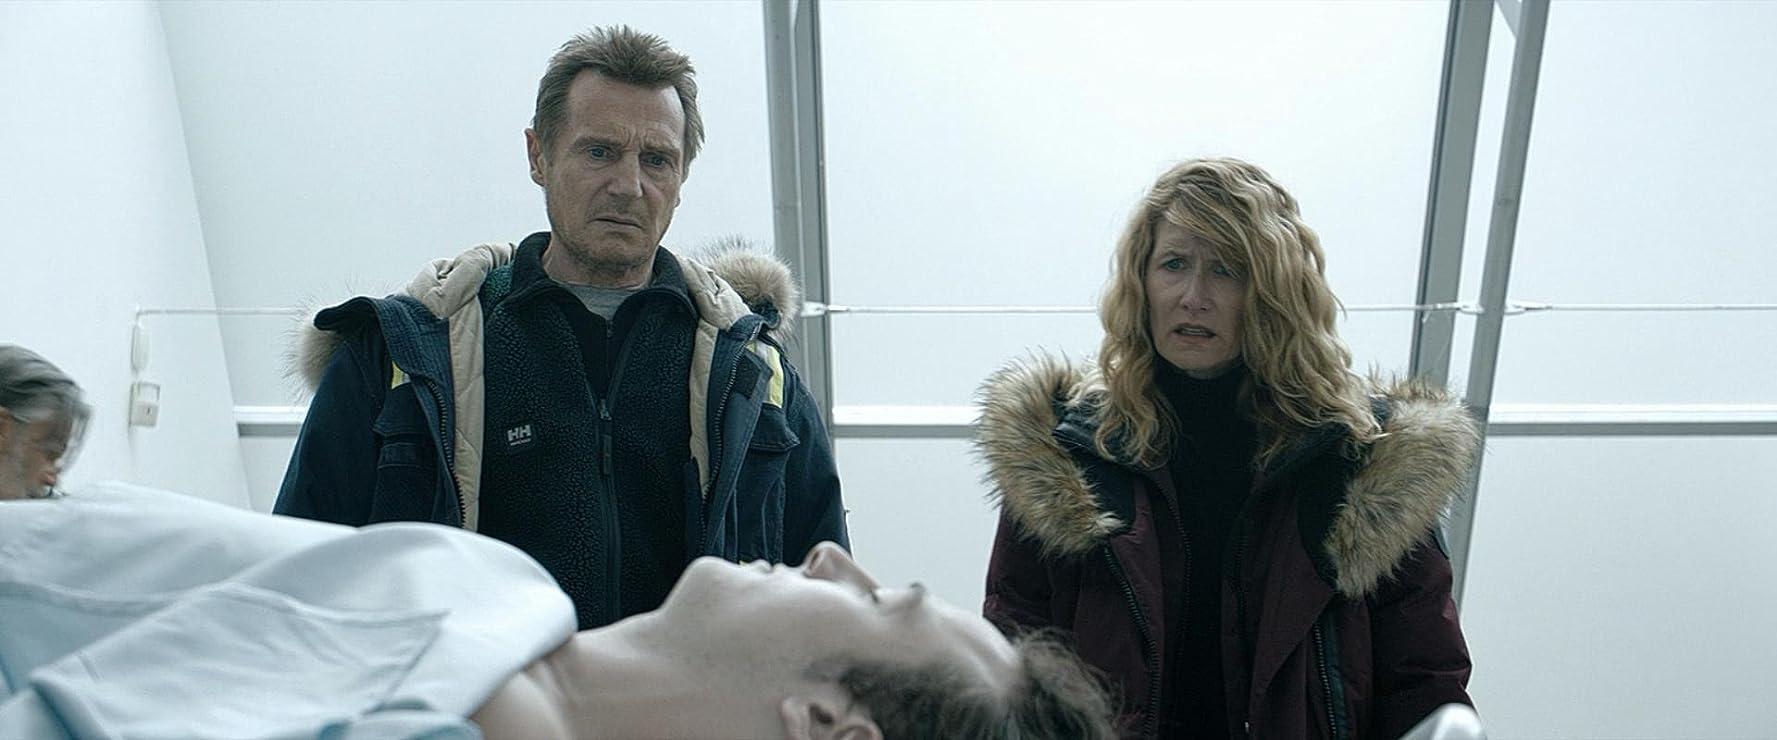 Laura Dern, Liam Neeson, and Micheál Richardson in Cold Pursuit (2019)